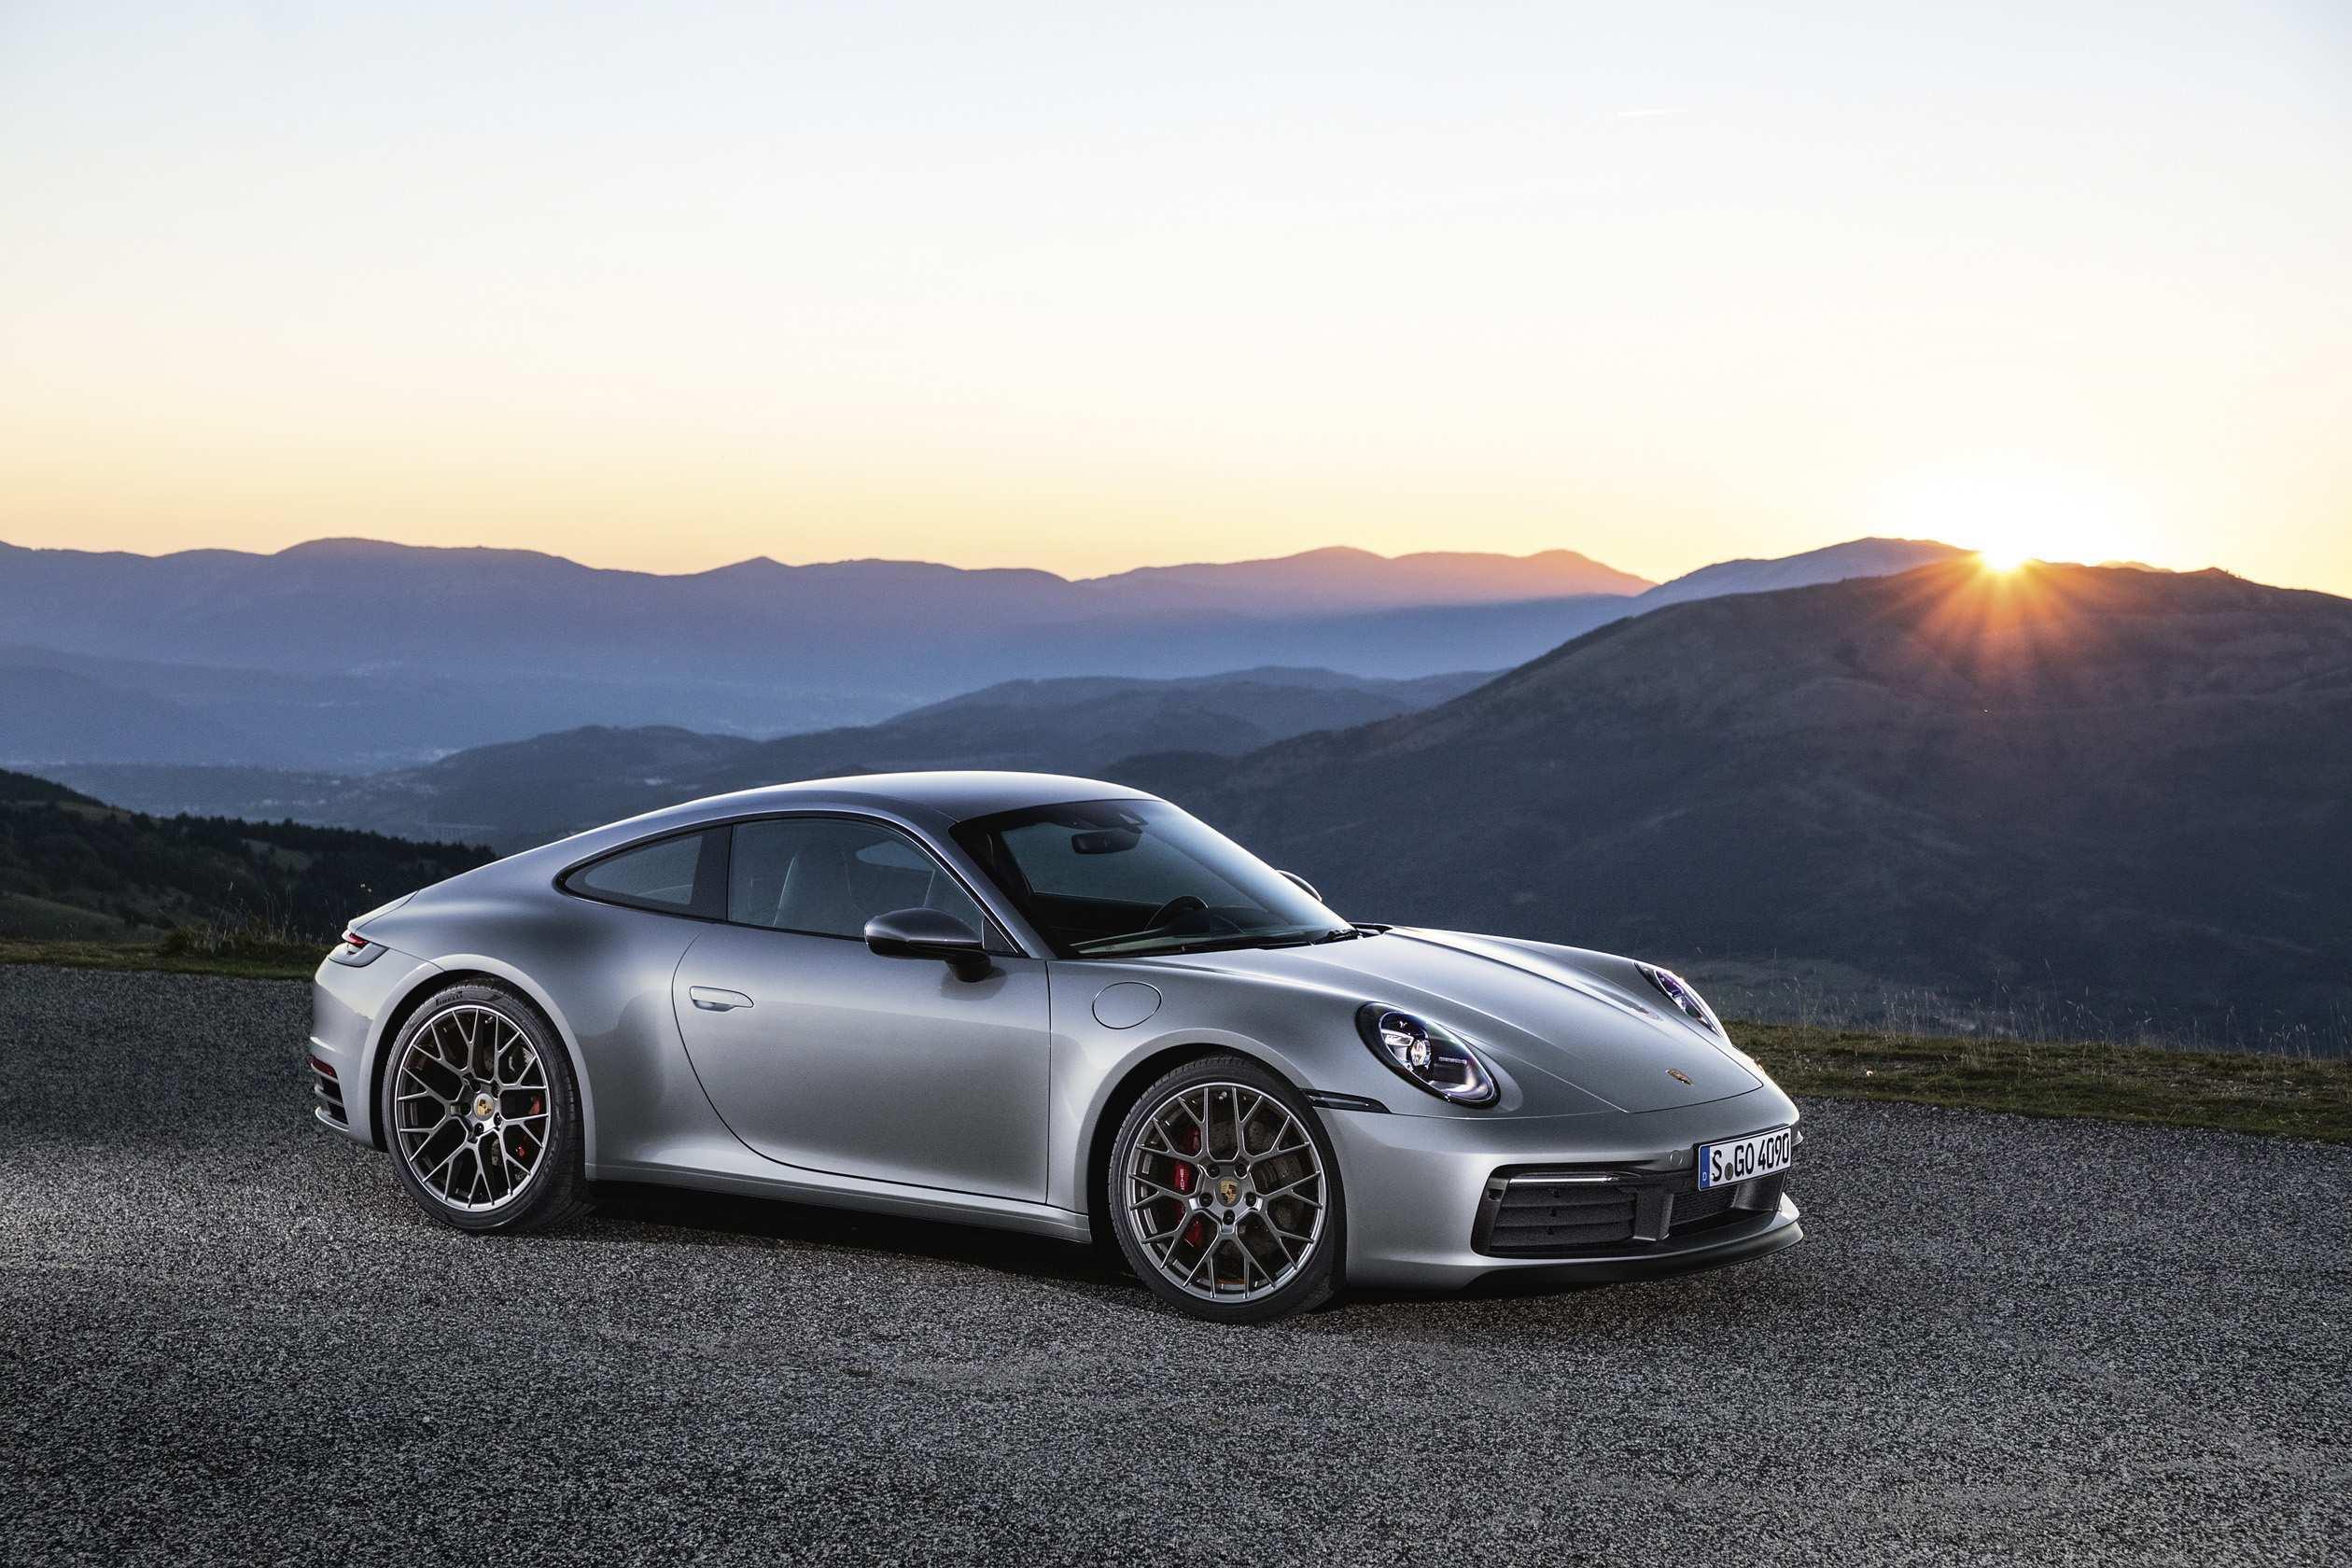 91 New 2020 Porsche 911 Performance for 2020 Porsche 911